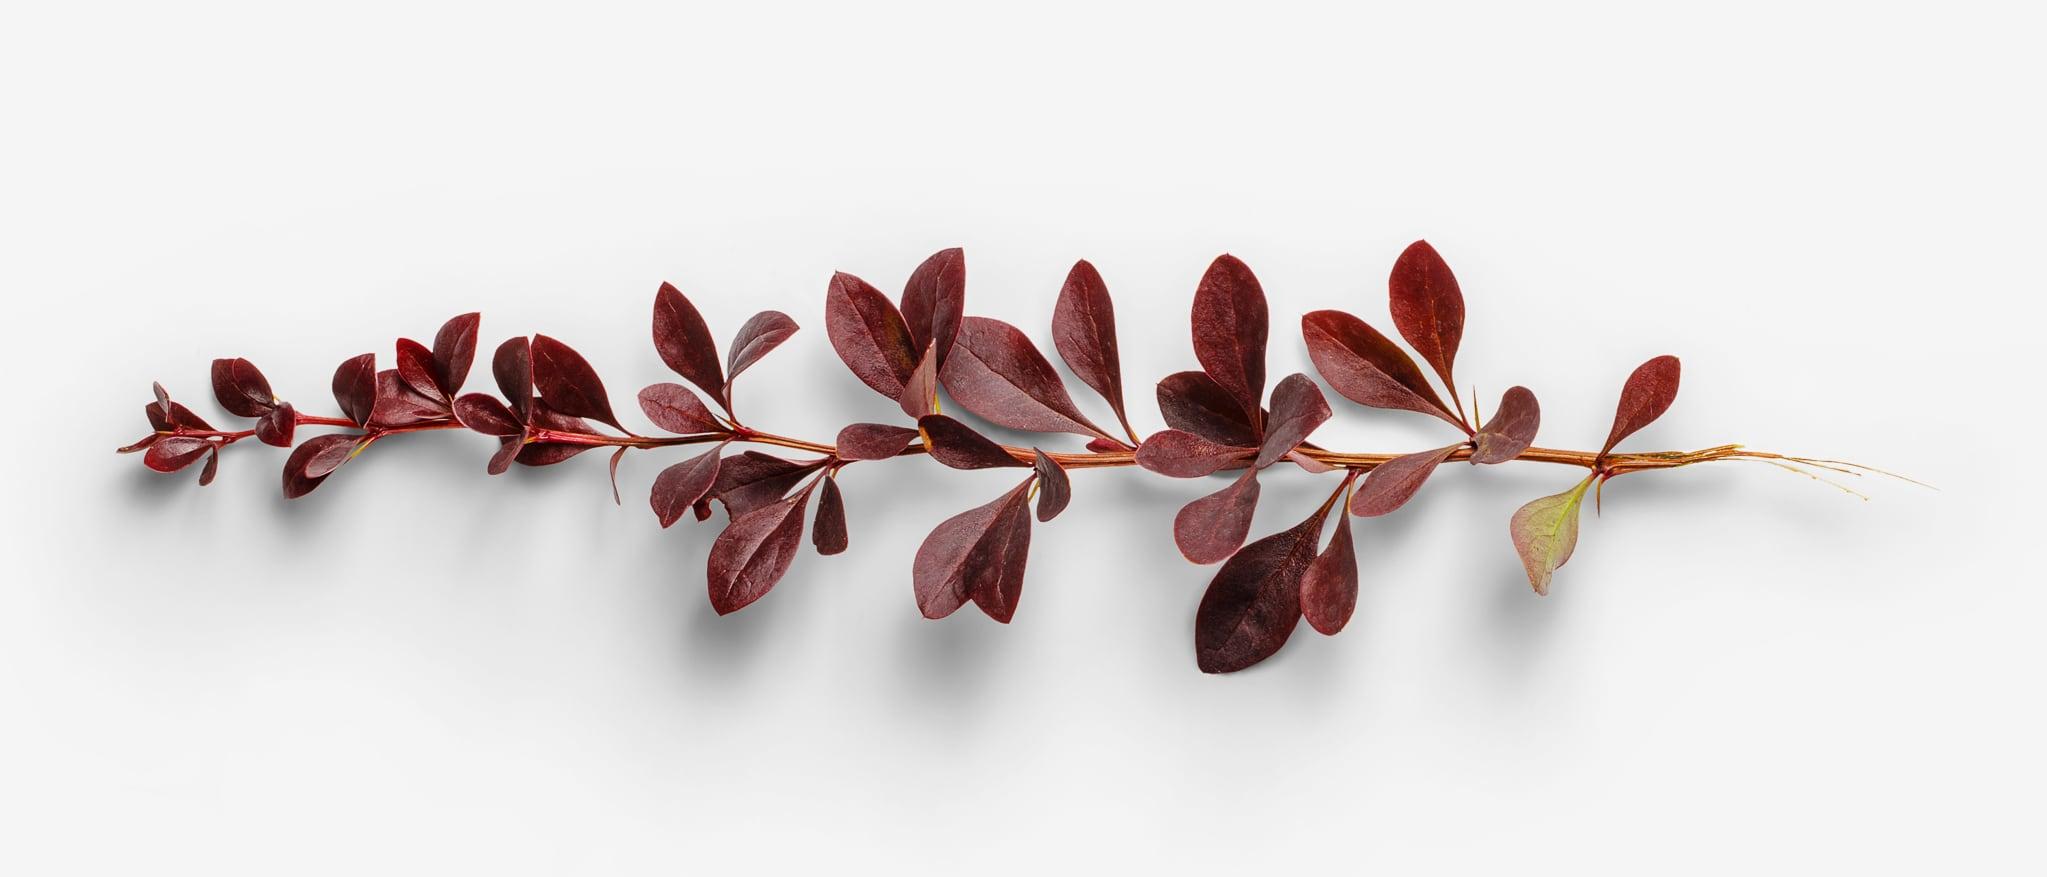 Leaf image with transparent background